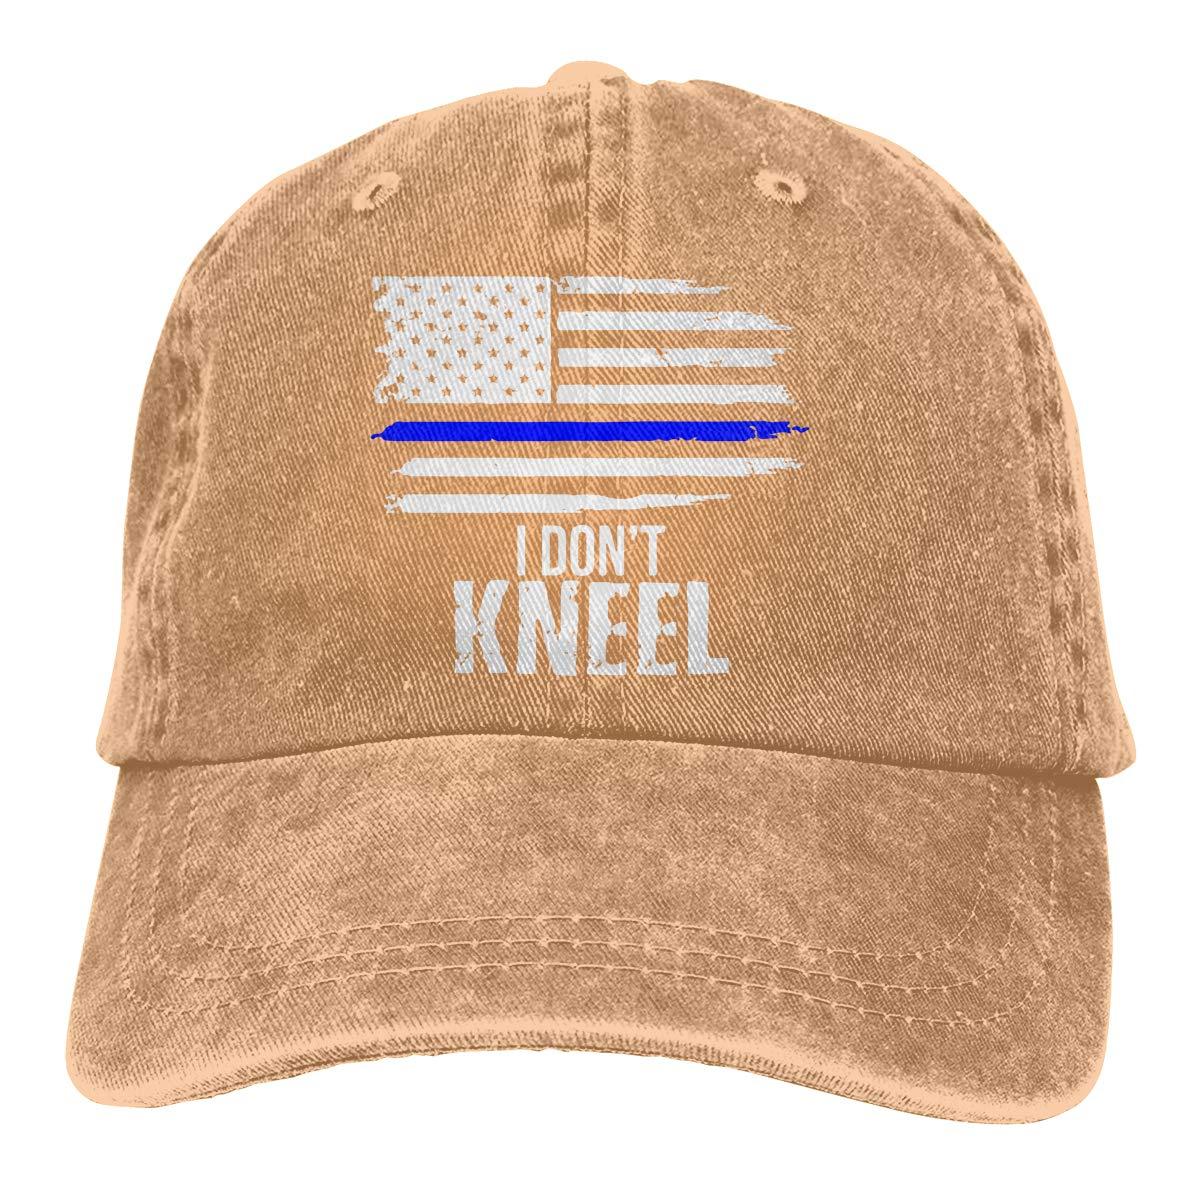 PMGM-C I Dont Kneel Unisex Personalize Cowboy Hat Outdoor Sports Hat Adjustable Baseball Cap